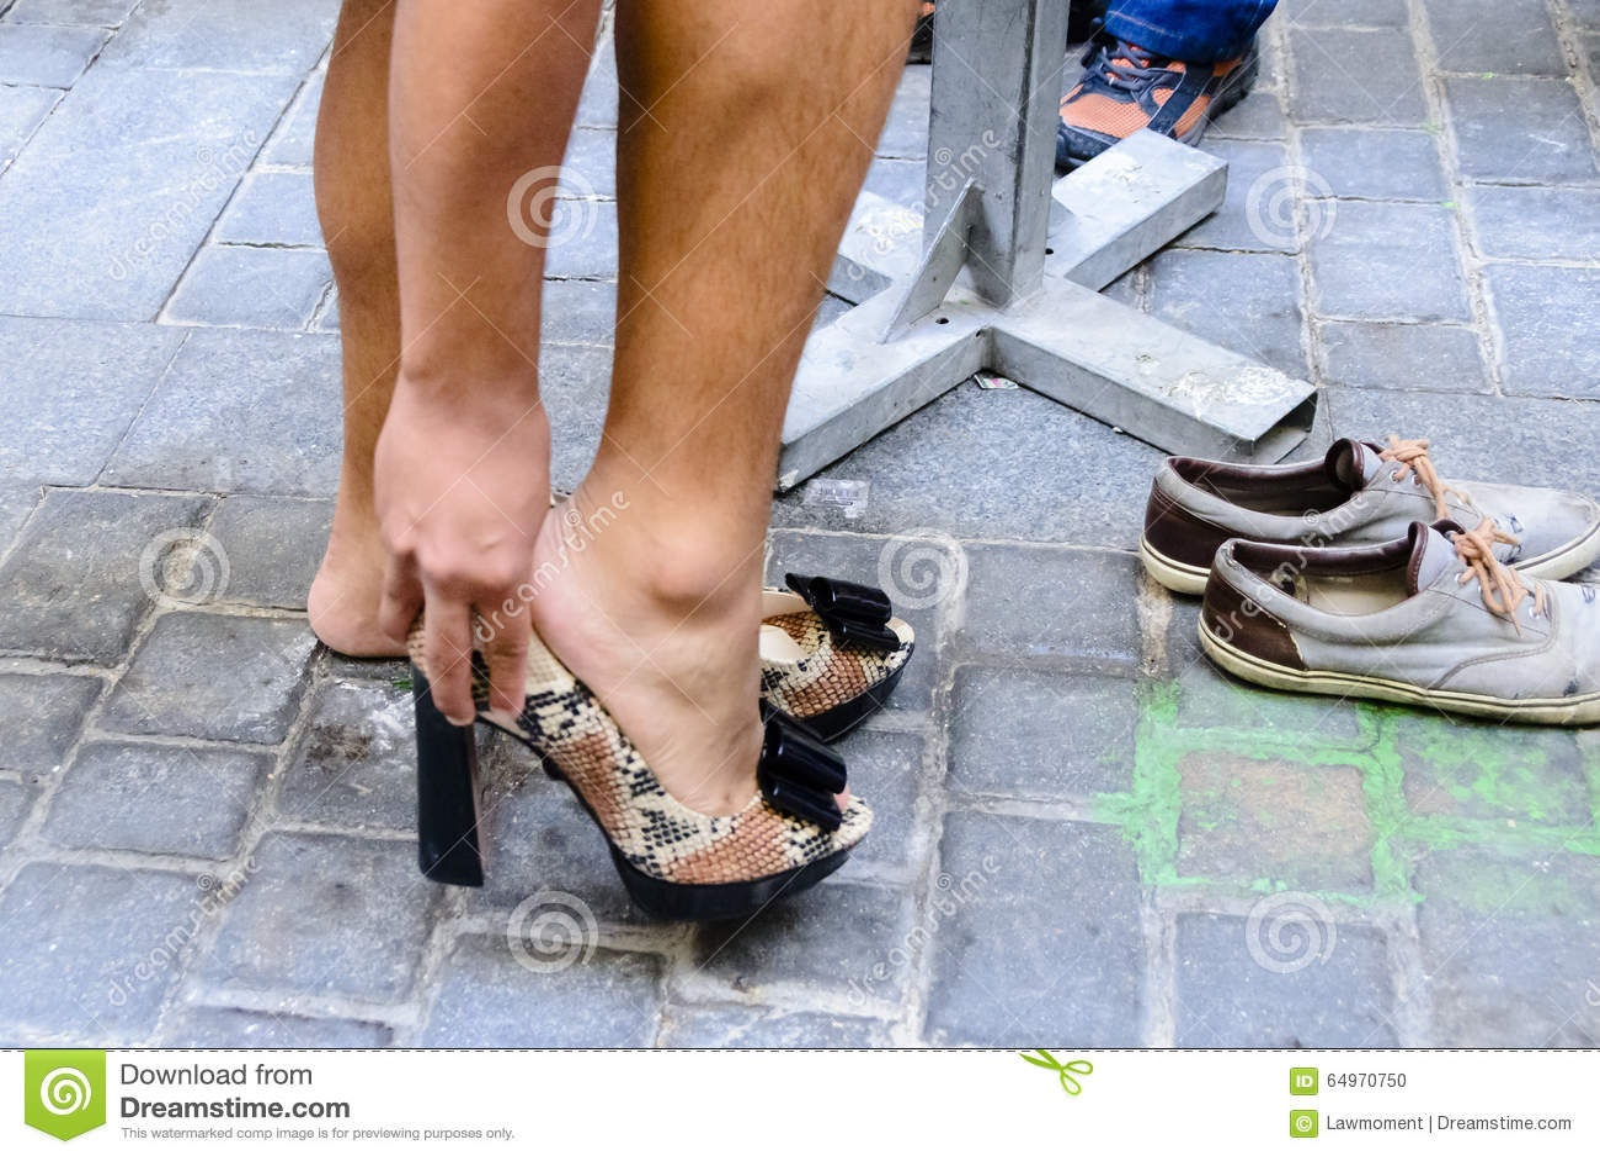 Lesbian feet jeans domination